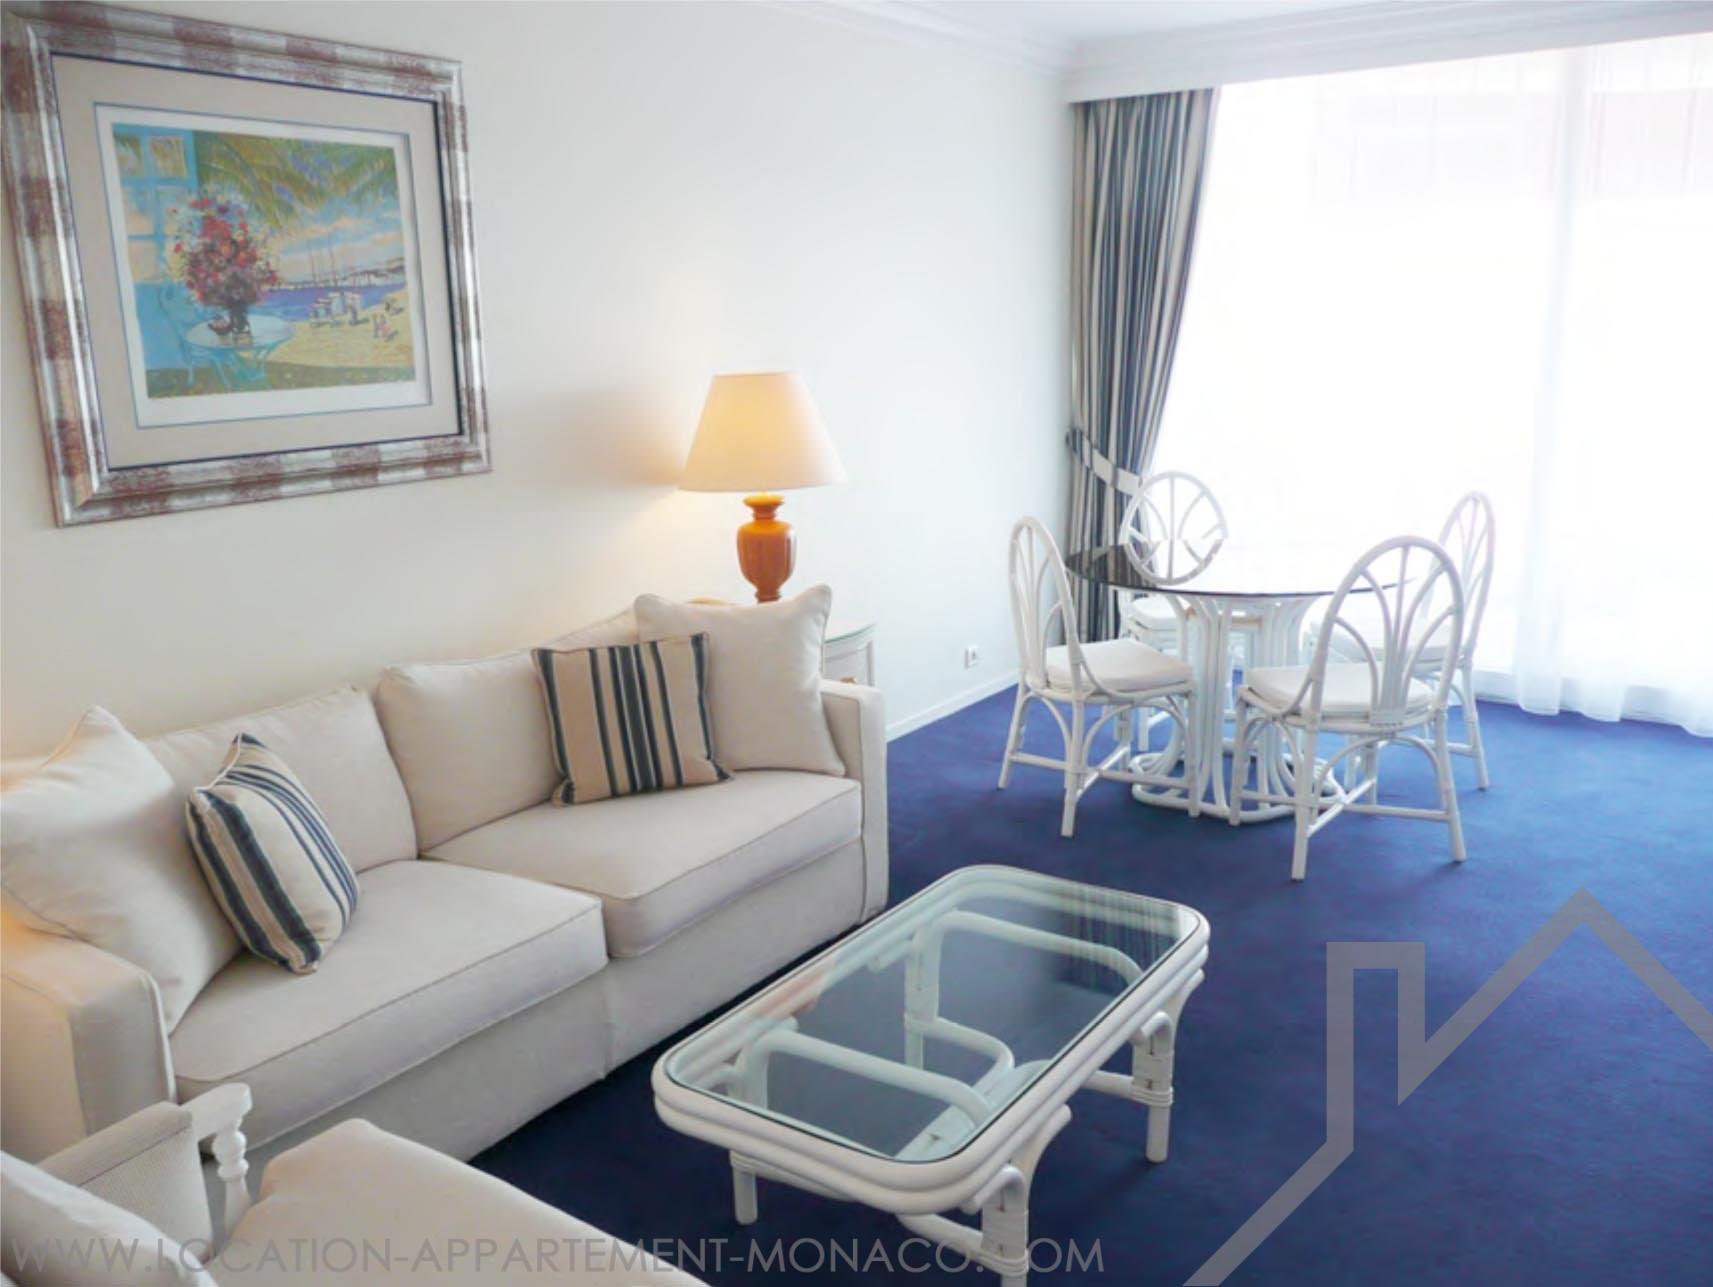 fairmont monte carlo furnished rentals apartments for. Black Bedroom Furniture Sets. Home Design Ideas